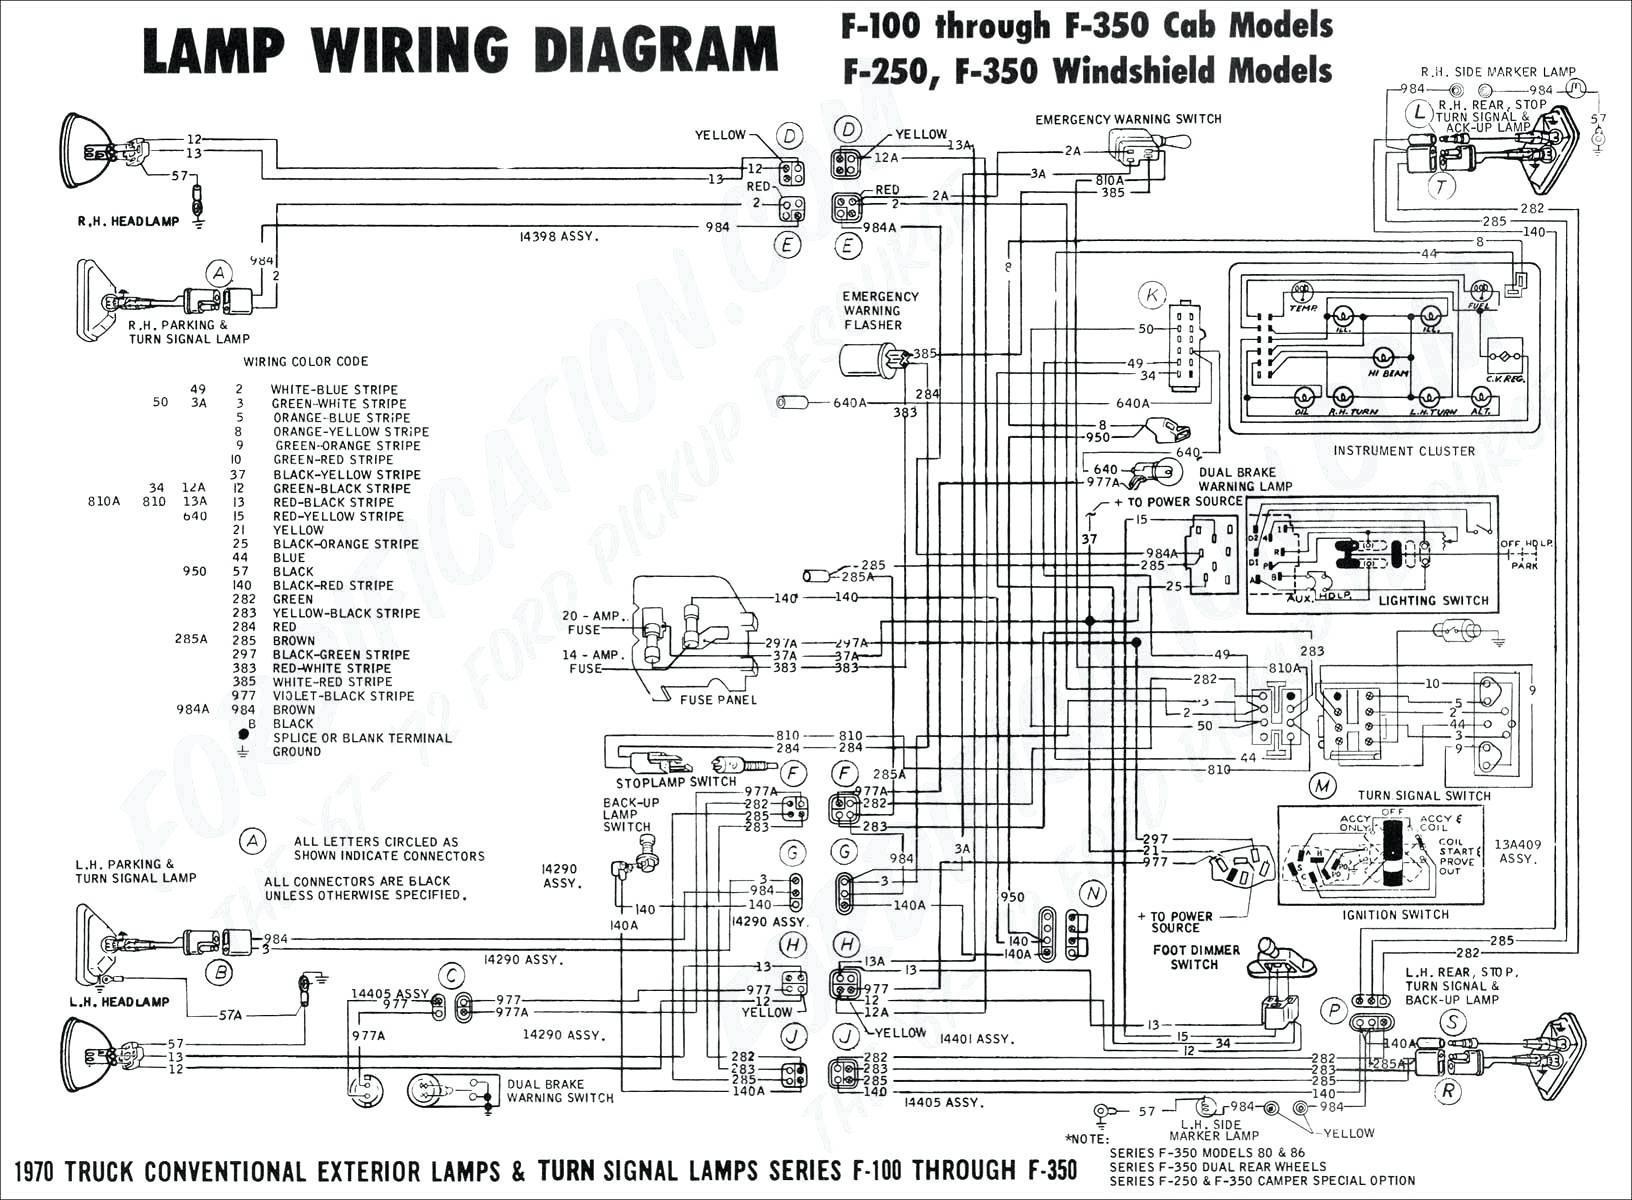 2005 Dodge Grand Caravan Engine Diagram Wiring Diagram for 2007 Dodge Grand Caravan Wiring Diagram Paper Of 2005 Dodge Grand Caravan Engine Diagram